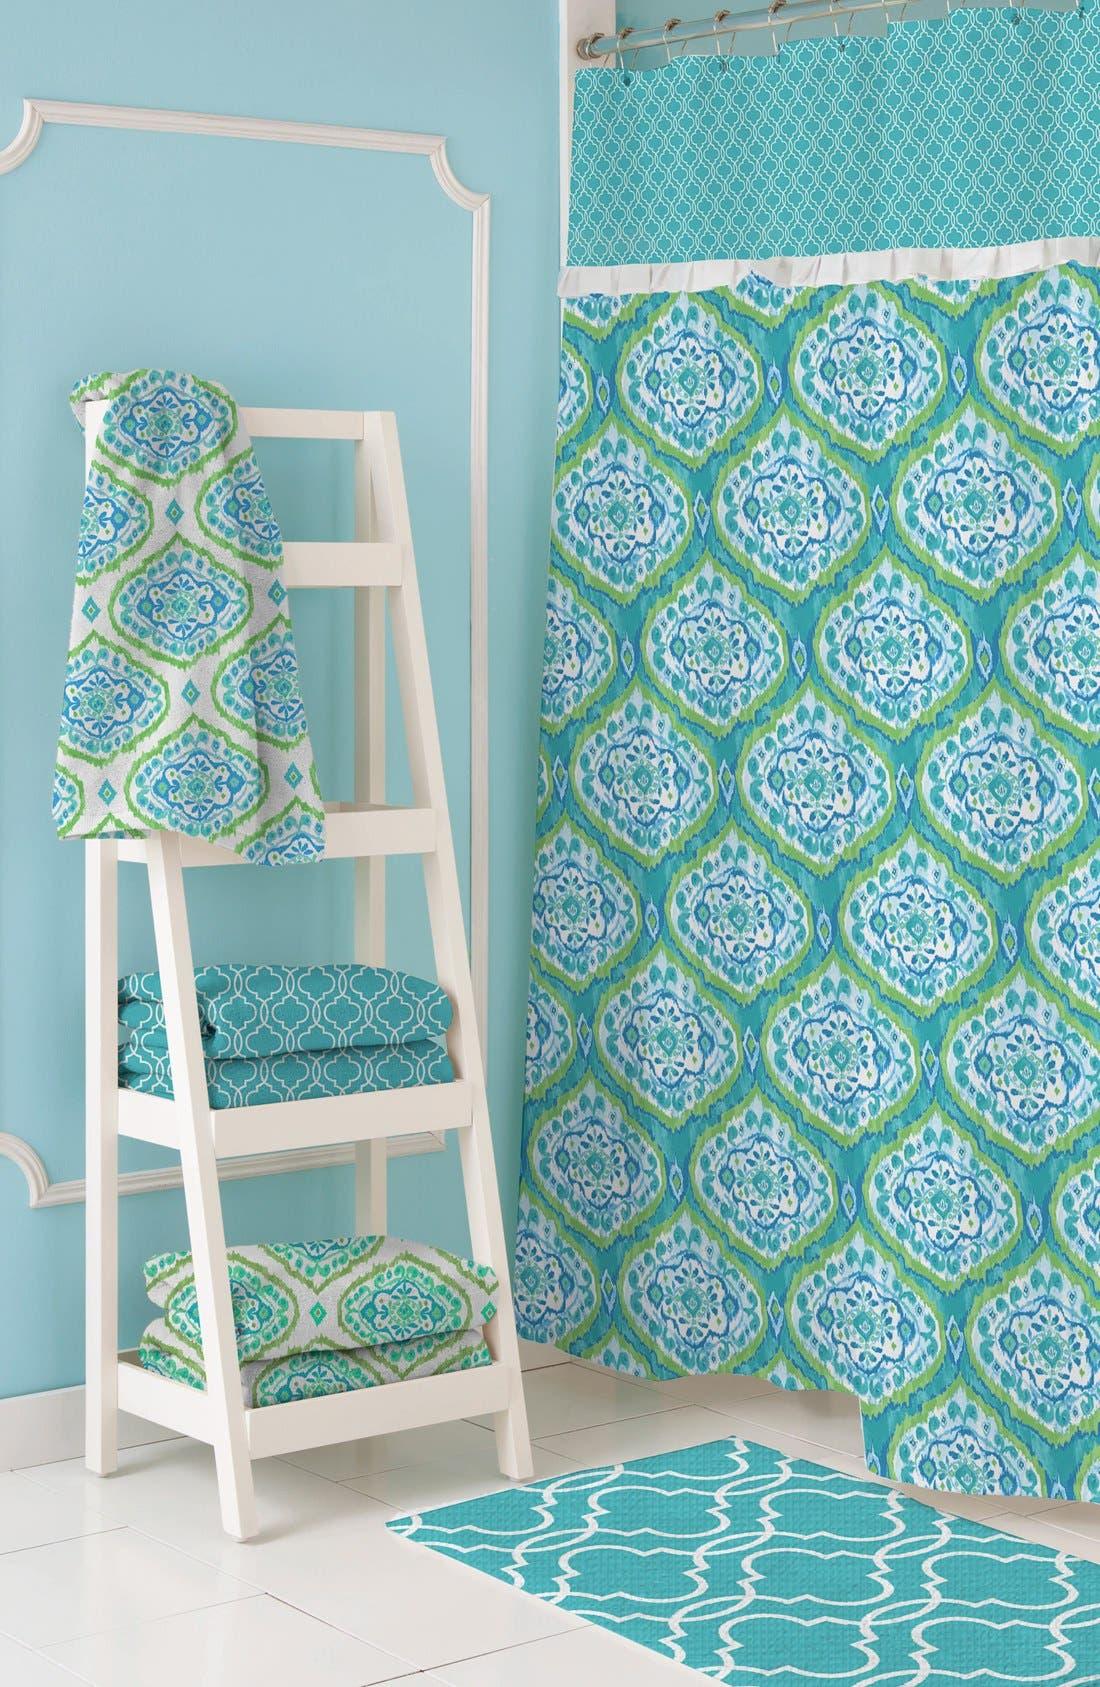 'Tangiers' Shower Curtain,                             Alternate thumbnail 3, color,                             Aqua